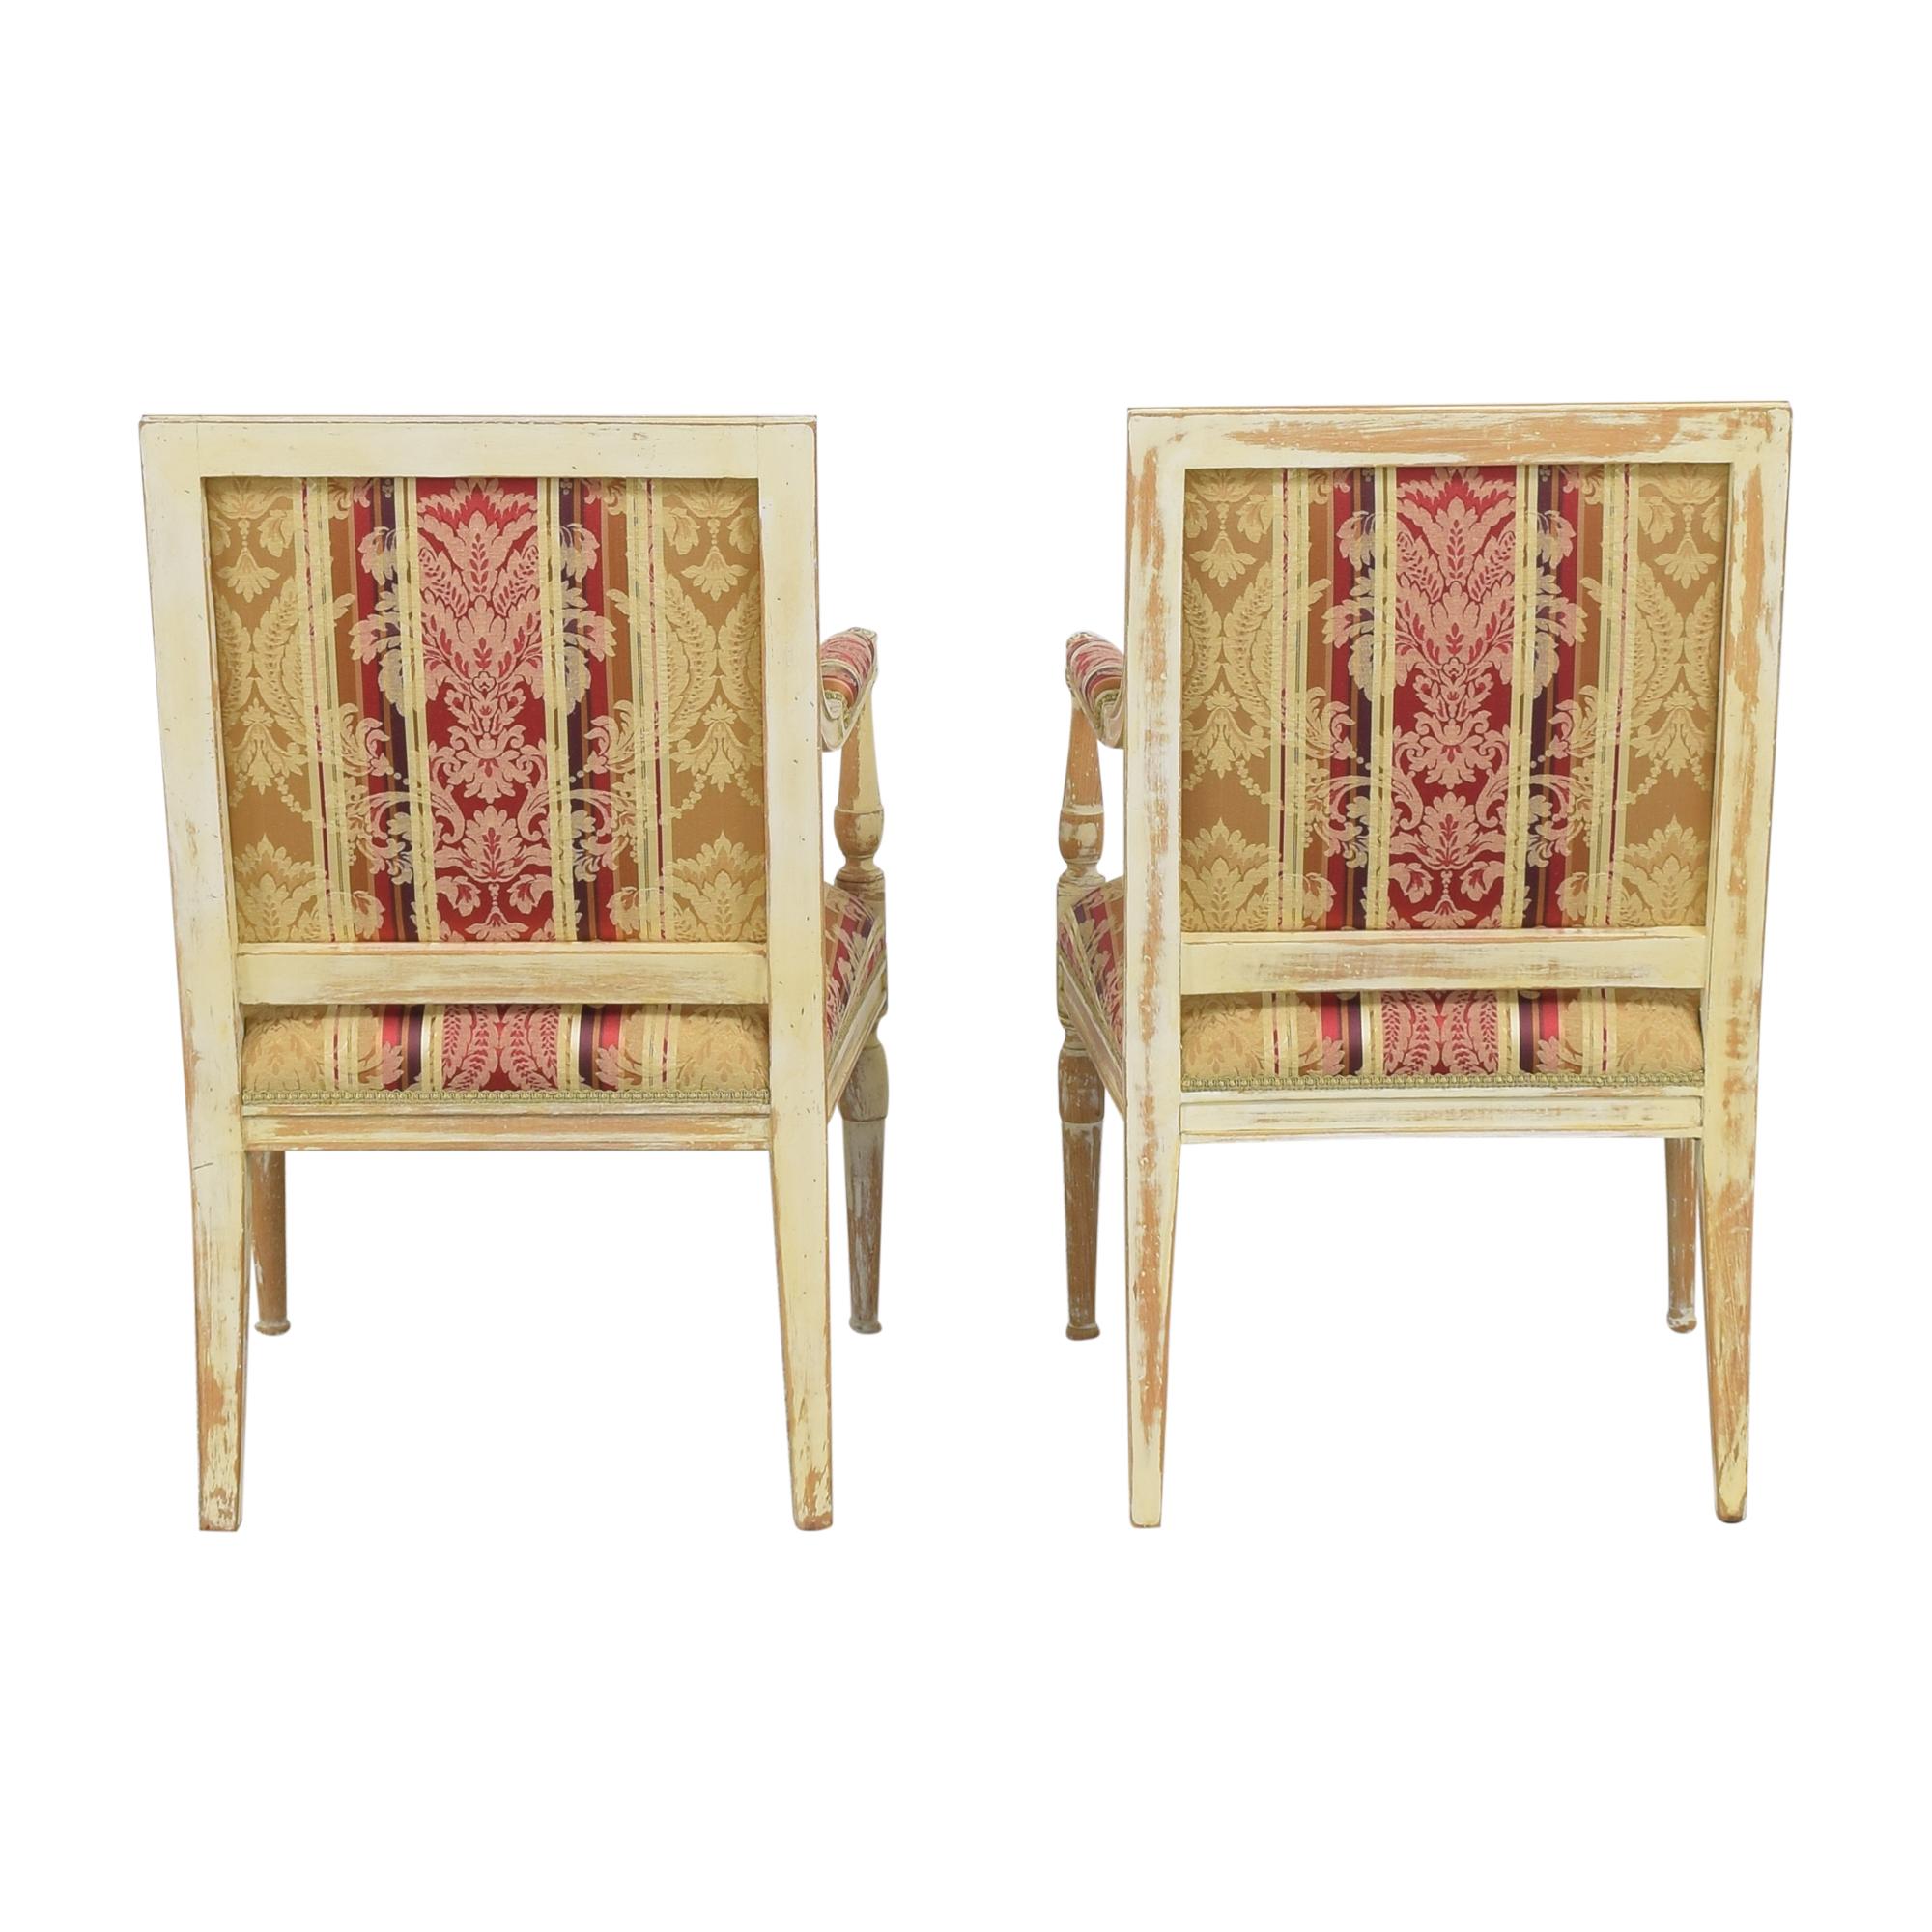 ABC Carpet & Home ABC Carpet & Home Louis XVI Style Chairs for sale